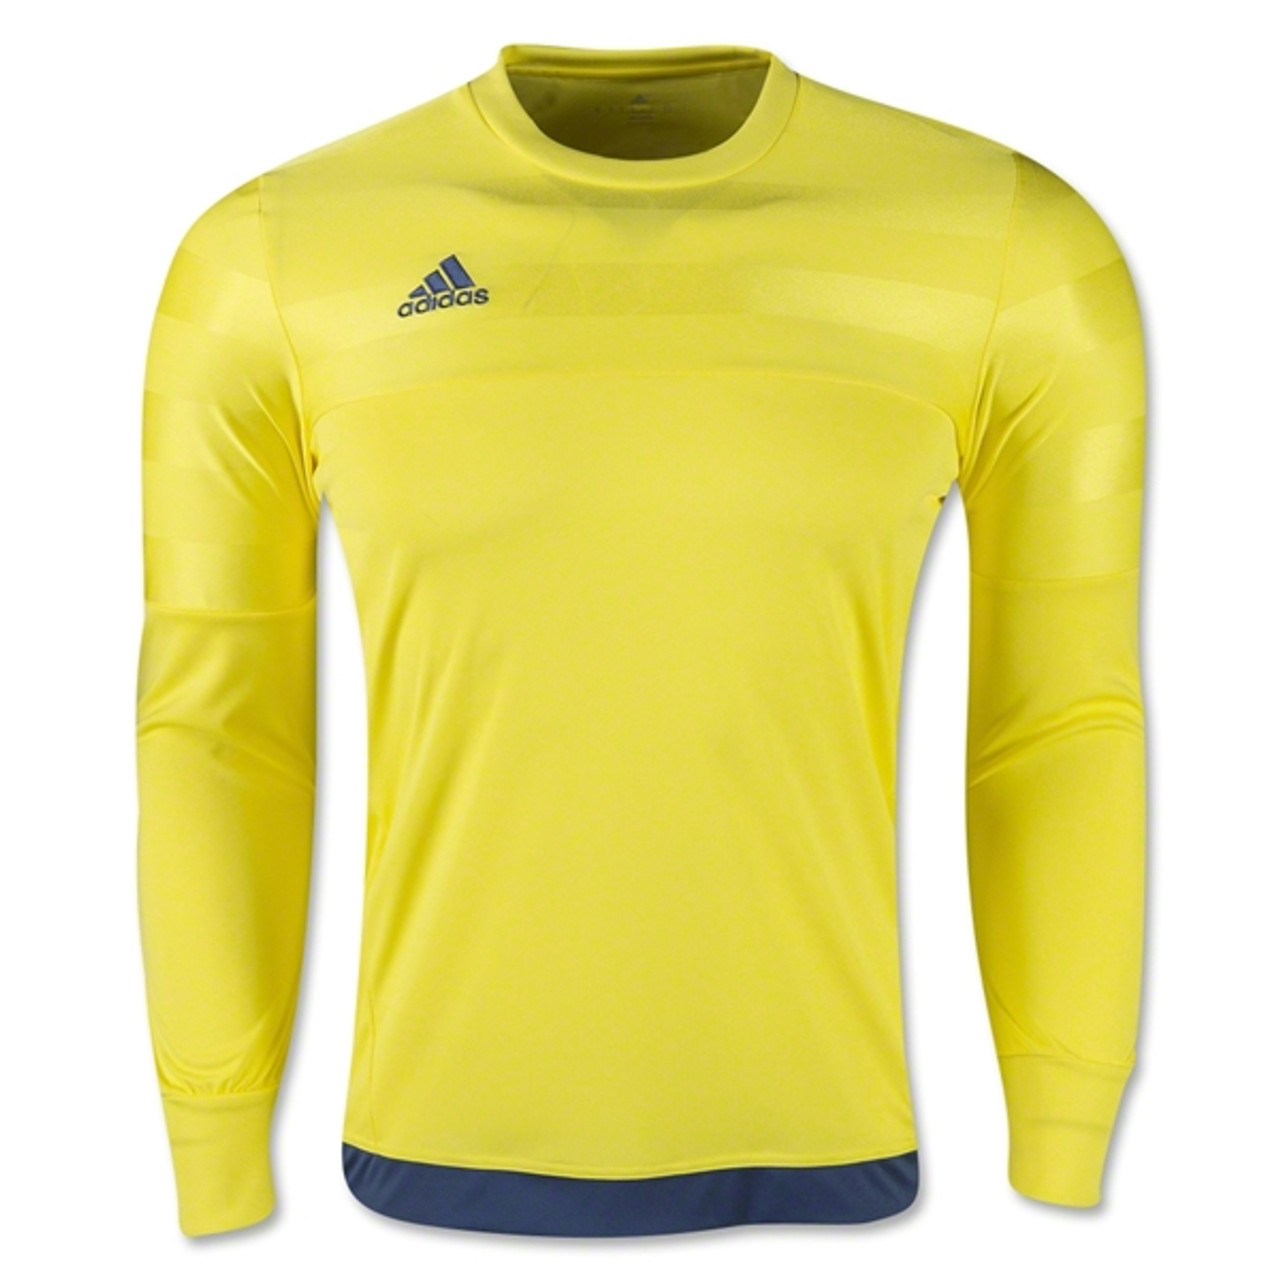 adidas Entry 15 Goalkeeper Jersey - Bright Yellow/Night Marine